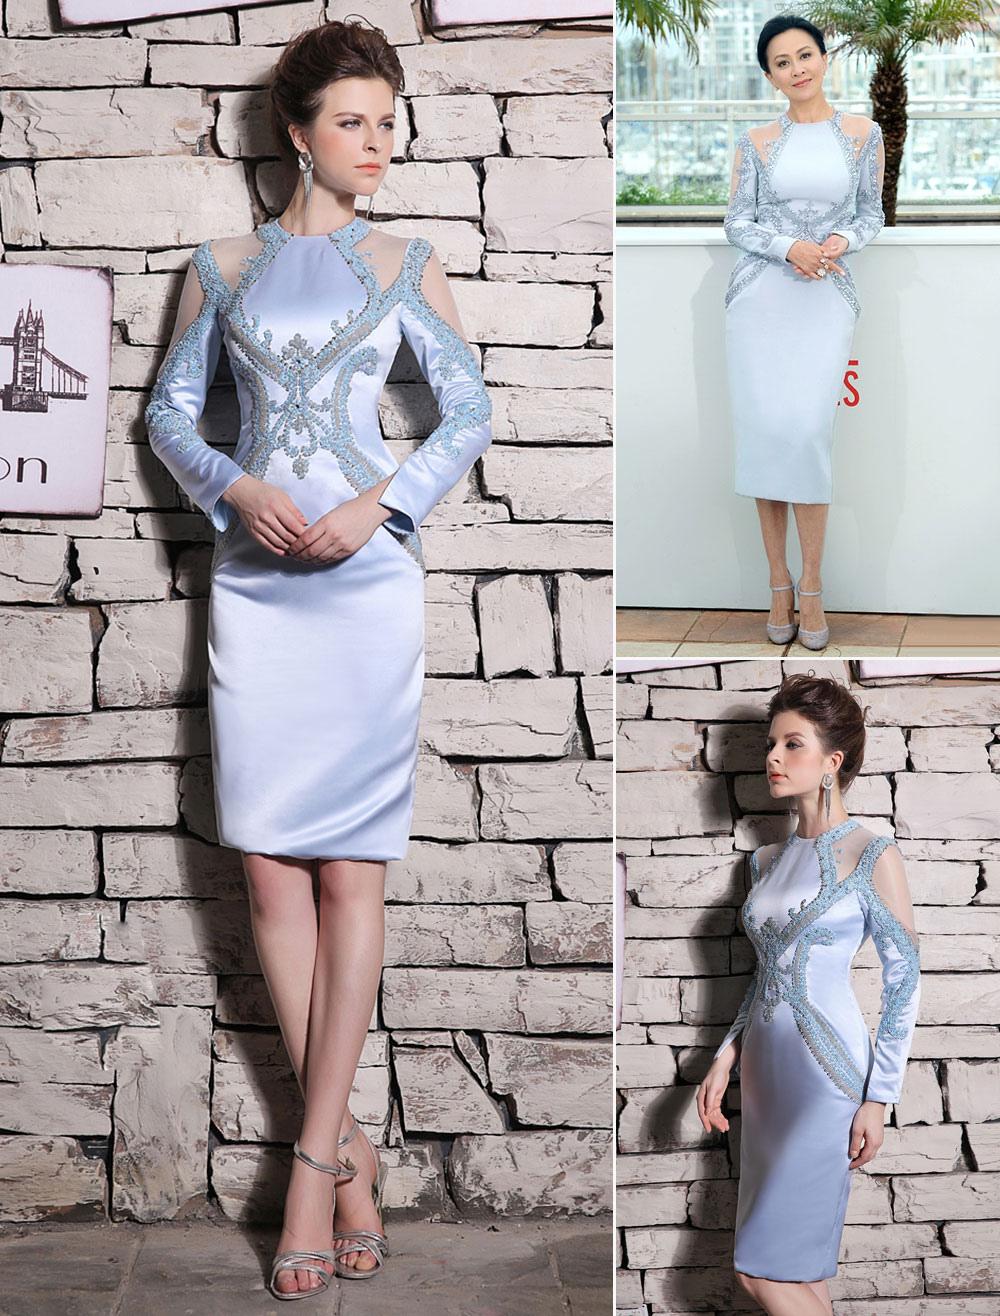 Buy Baby Blue Cocktail Dress Satin Beading Prom Dress Elegant Jewel Neck Sleeveless Sheath Party Dress Wedding Guest Dress Milanoo for $180.89 in Milanoo store